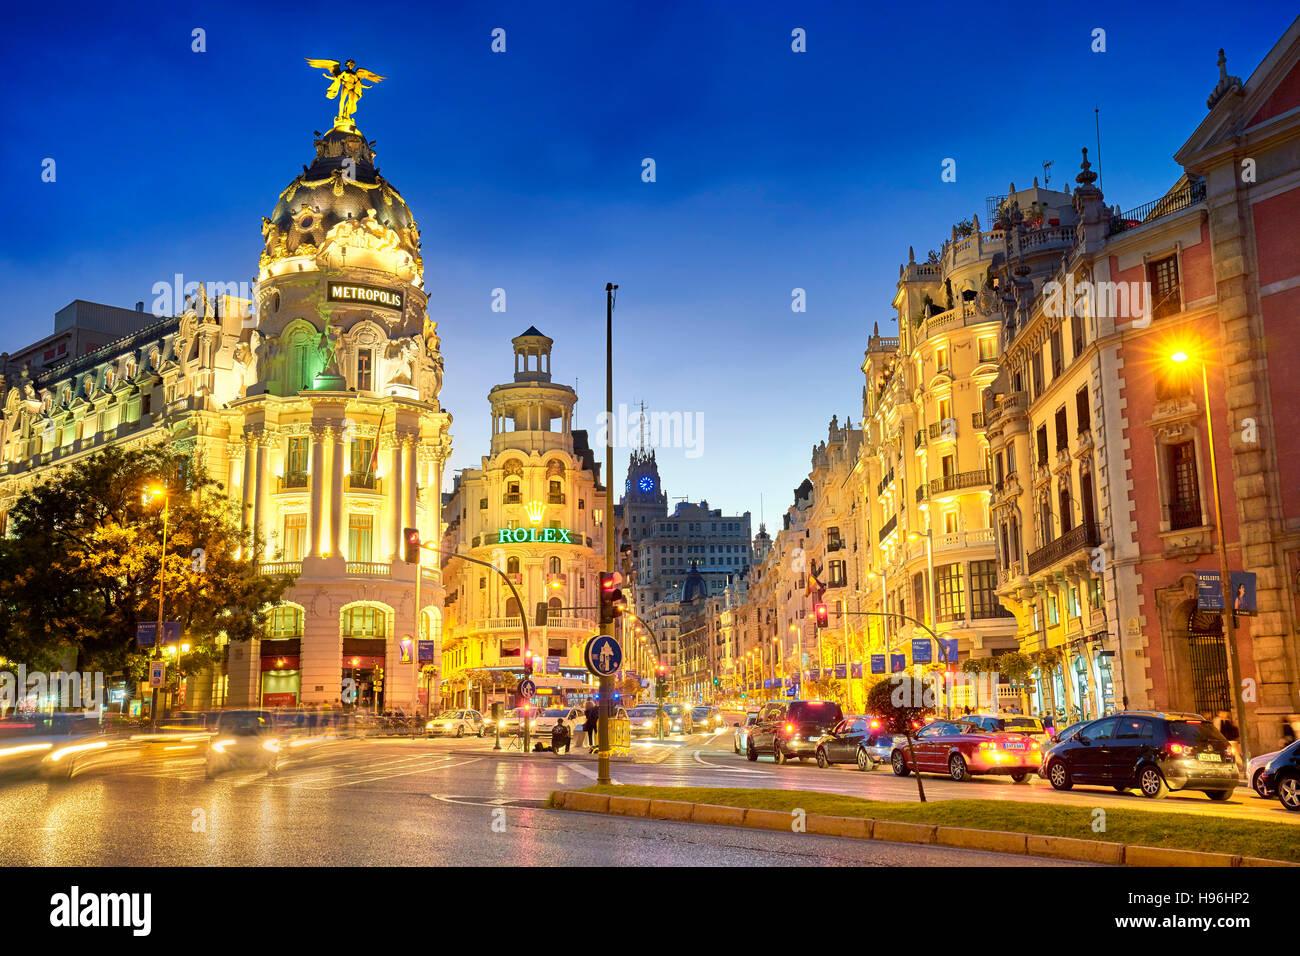 Metropolis building at evening, Gran Via, Madrid, Spain - Stock Image